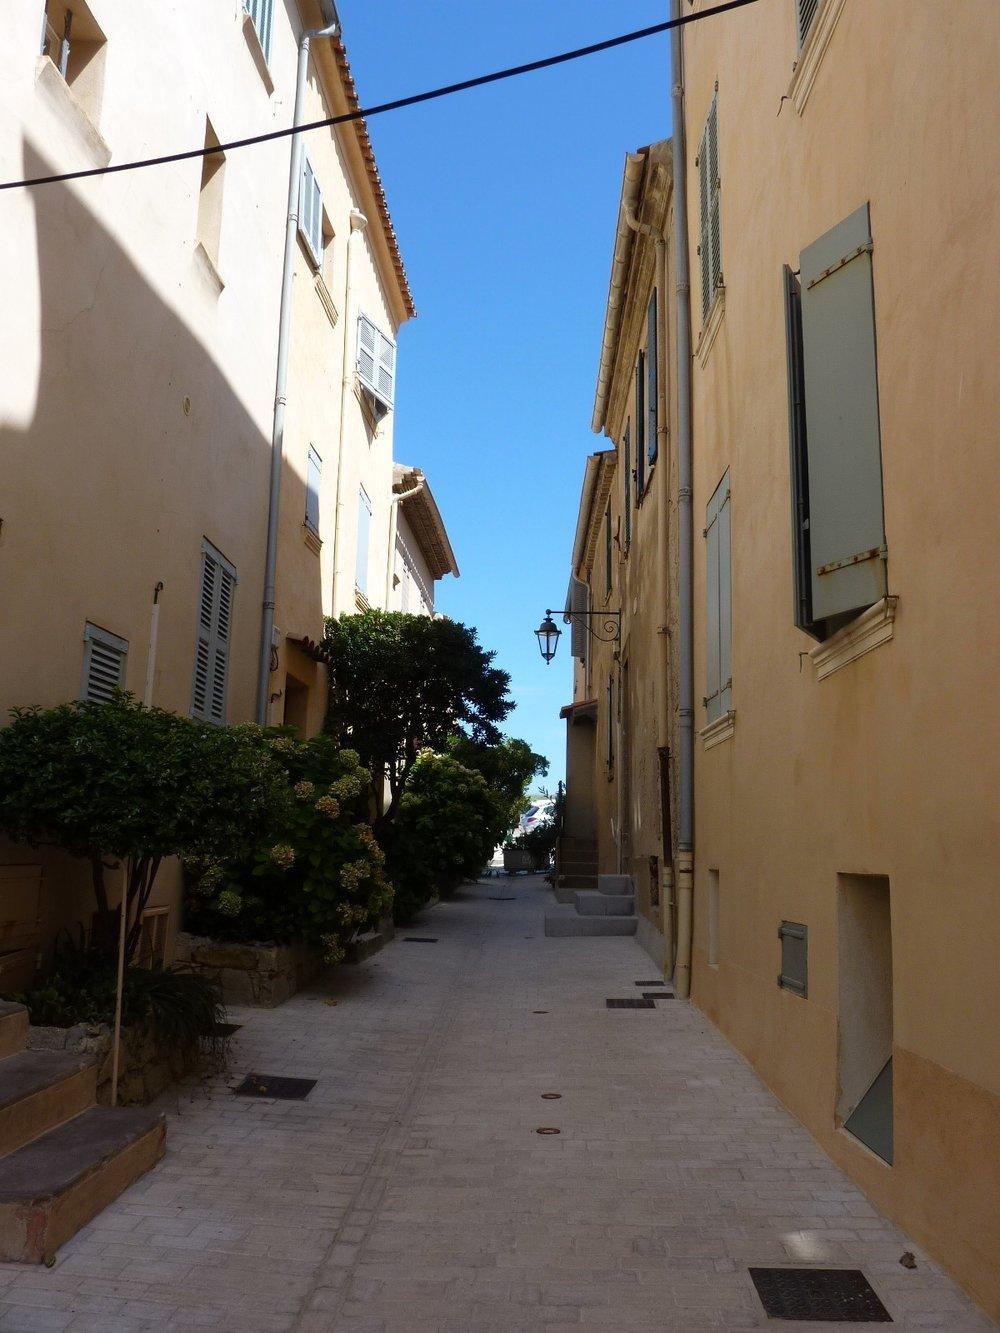 St-Tropez-pristine-streets.jpg